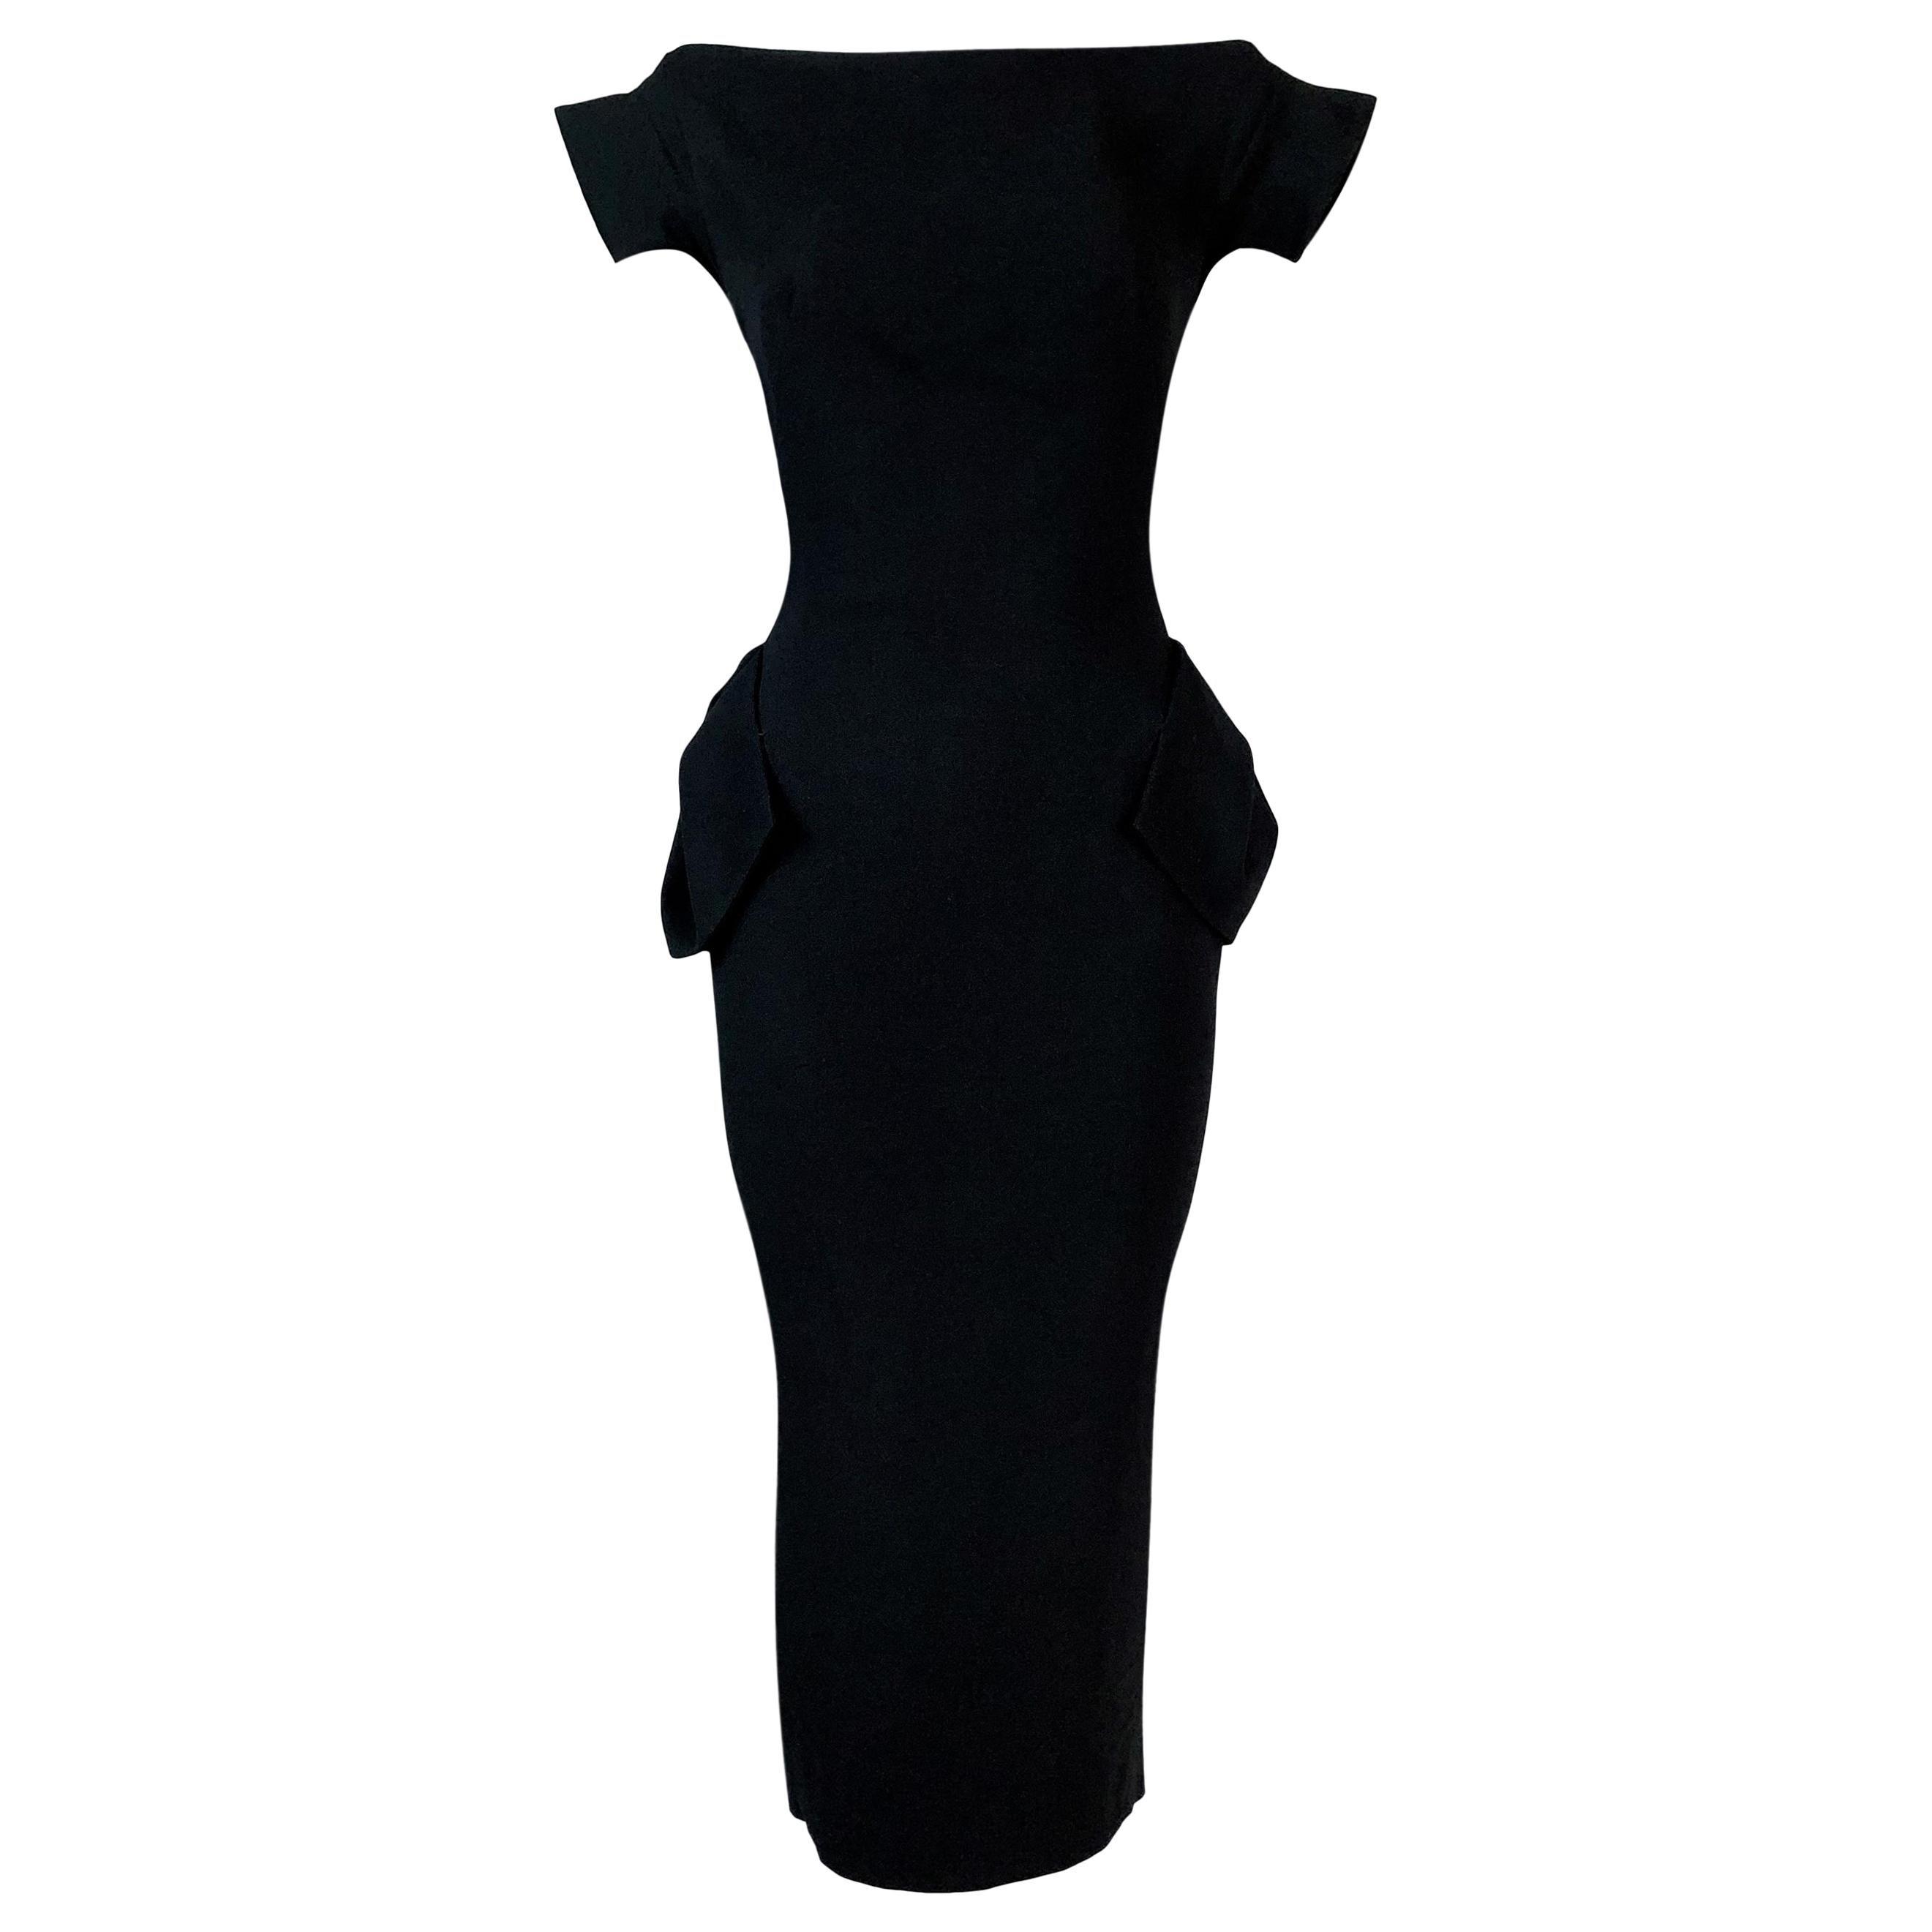 F/W 1995 John Galliano Runway 'Delores' Pin-Up Black Crepe Dress